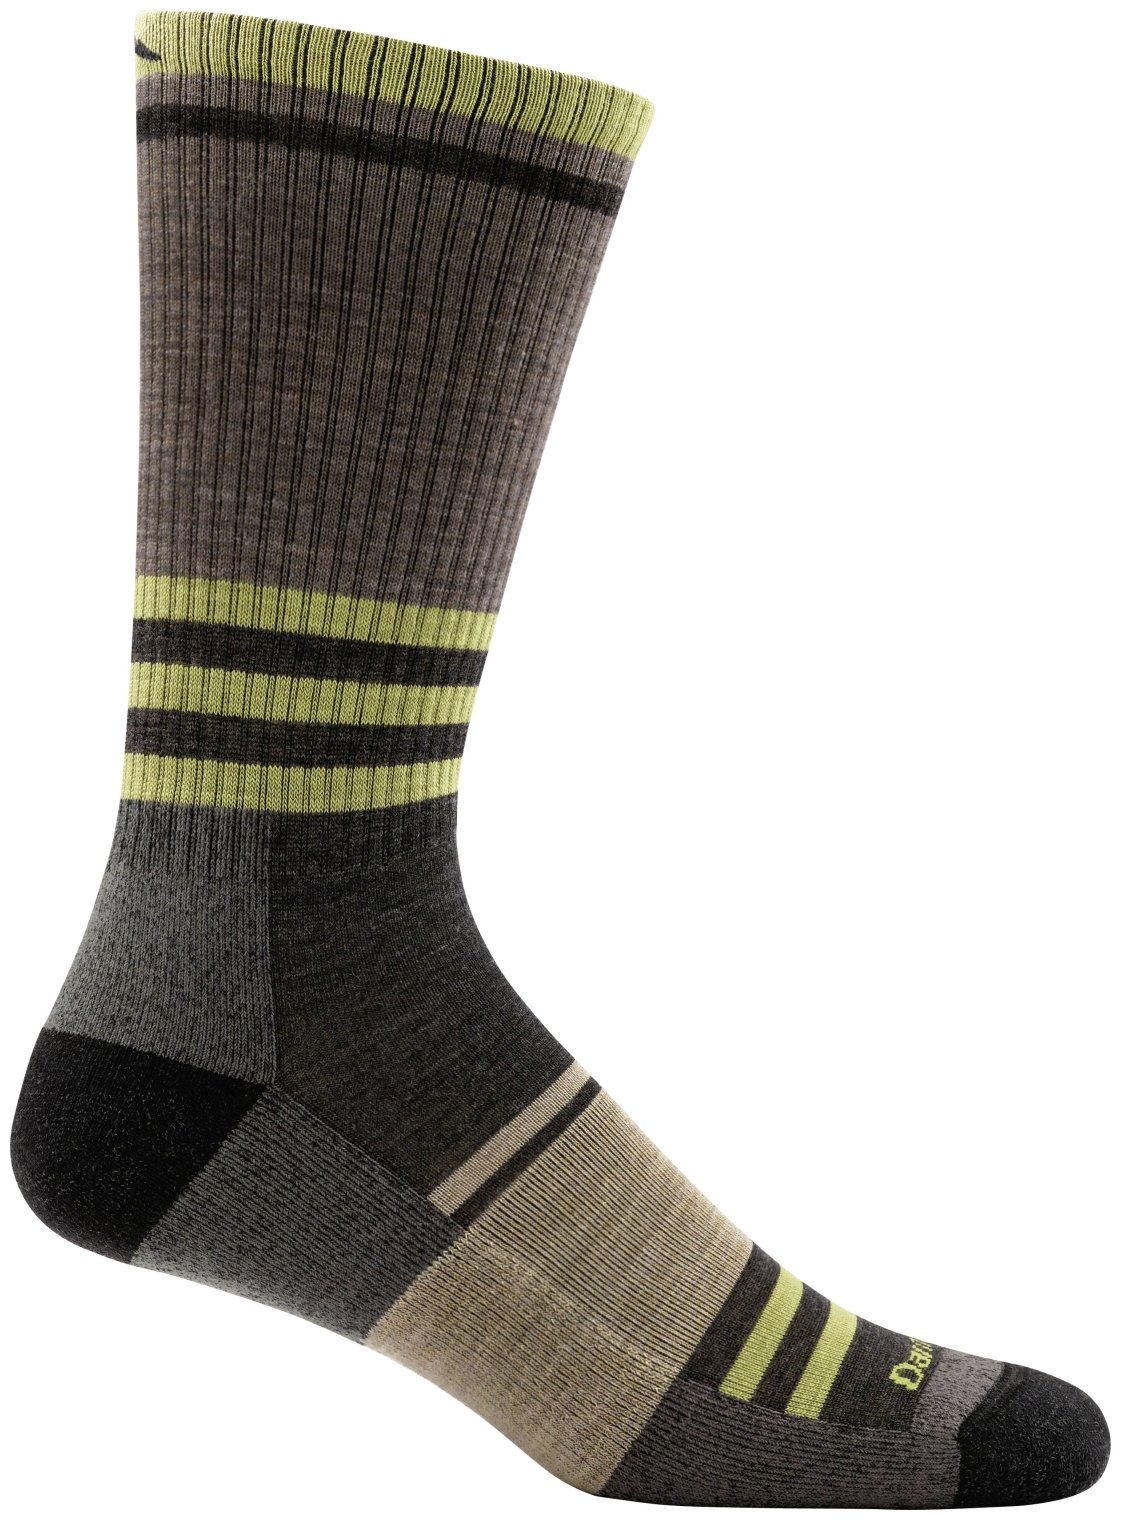 Darn Tough Spur Boot Light Cushion Sock - Men's Brown Small